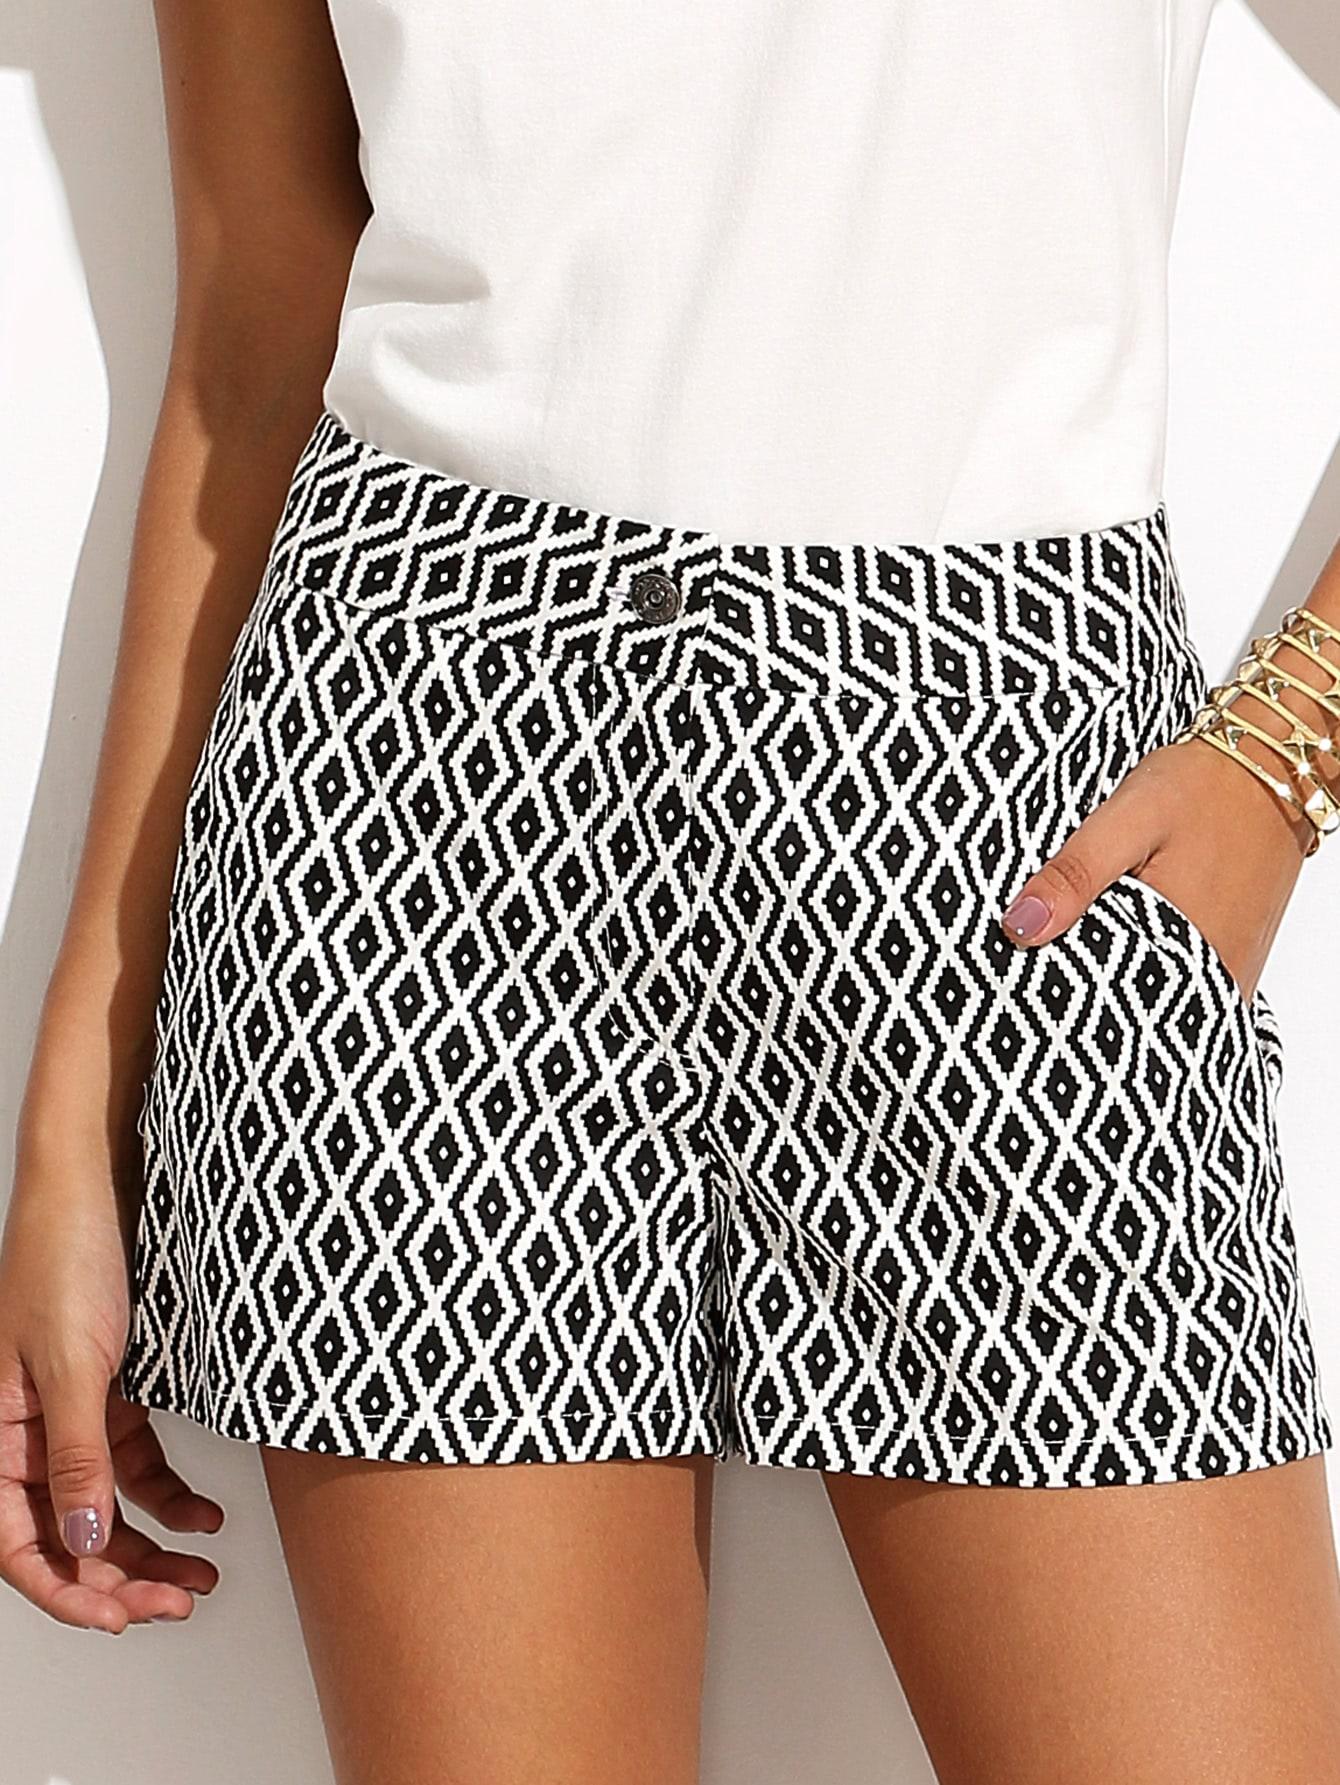 Black and White Pattern Pocket Shorts -SheIn(Sheinside)